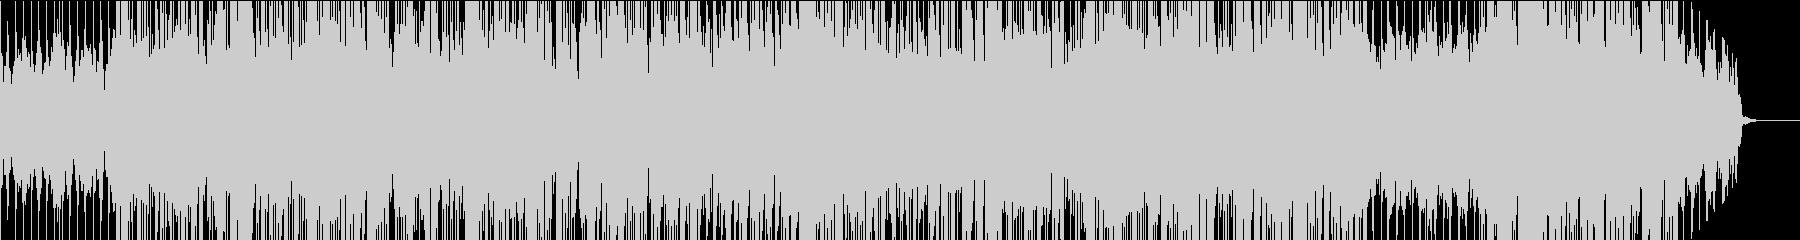 Machine-Session #0の未再生の波形